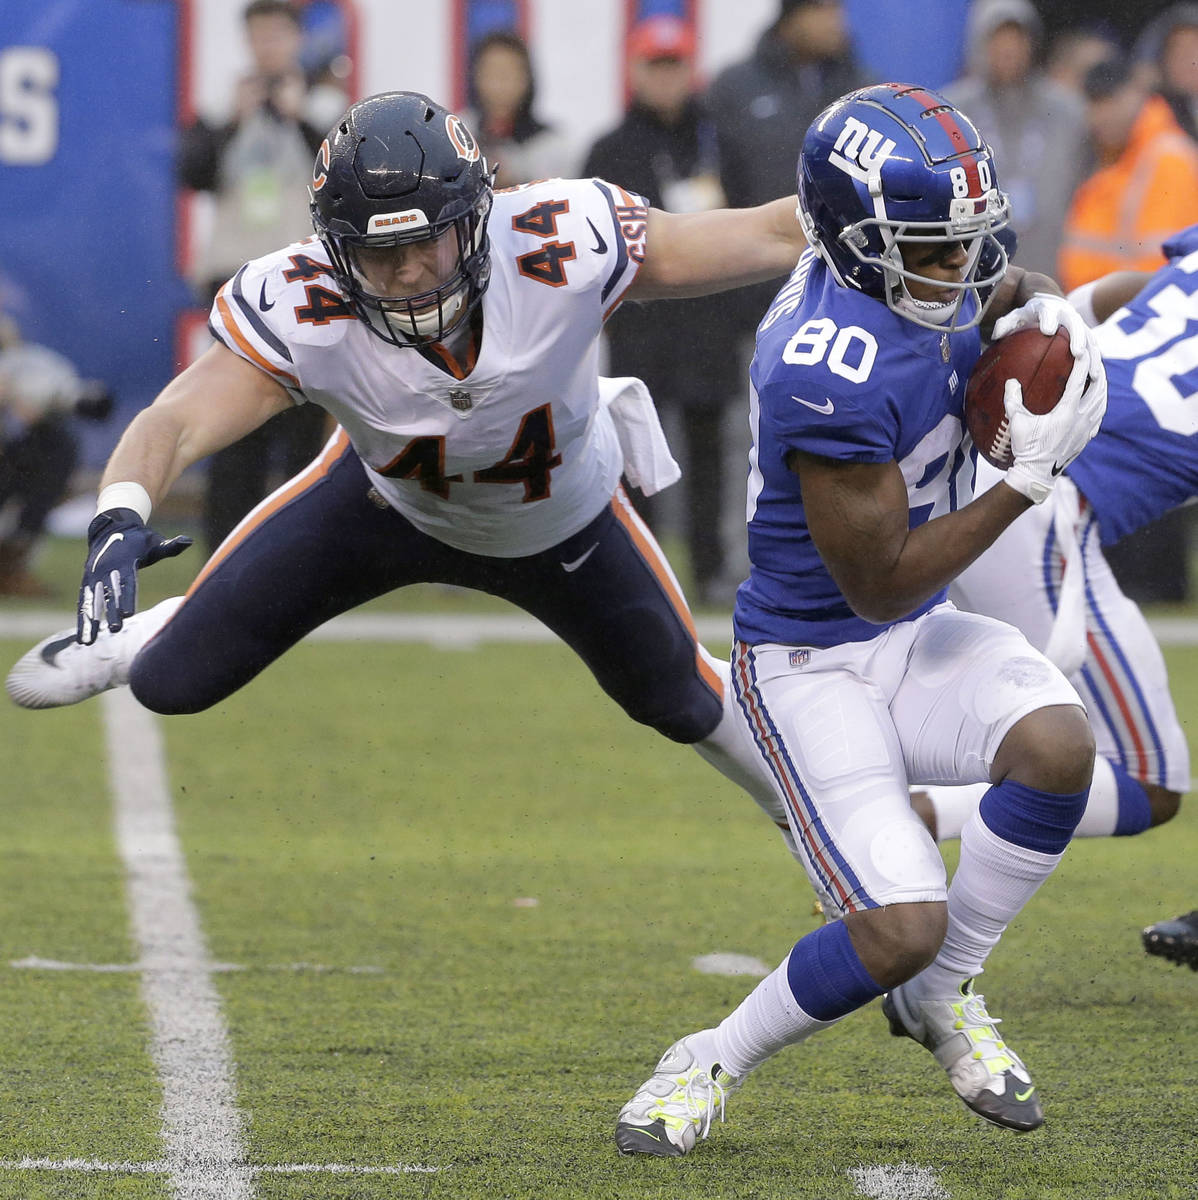 Chicago Bears' Nick Kwiatkoski (44) makes a hit on New York Giants' Jawill Davis (80) during a ...